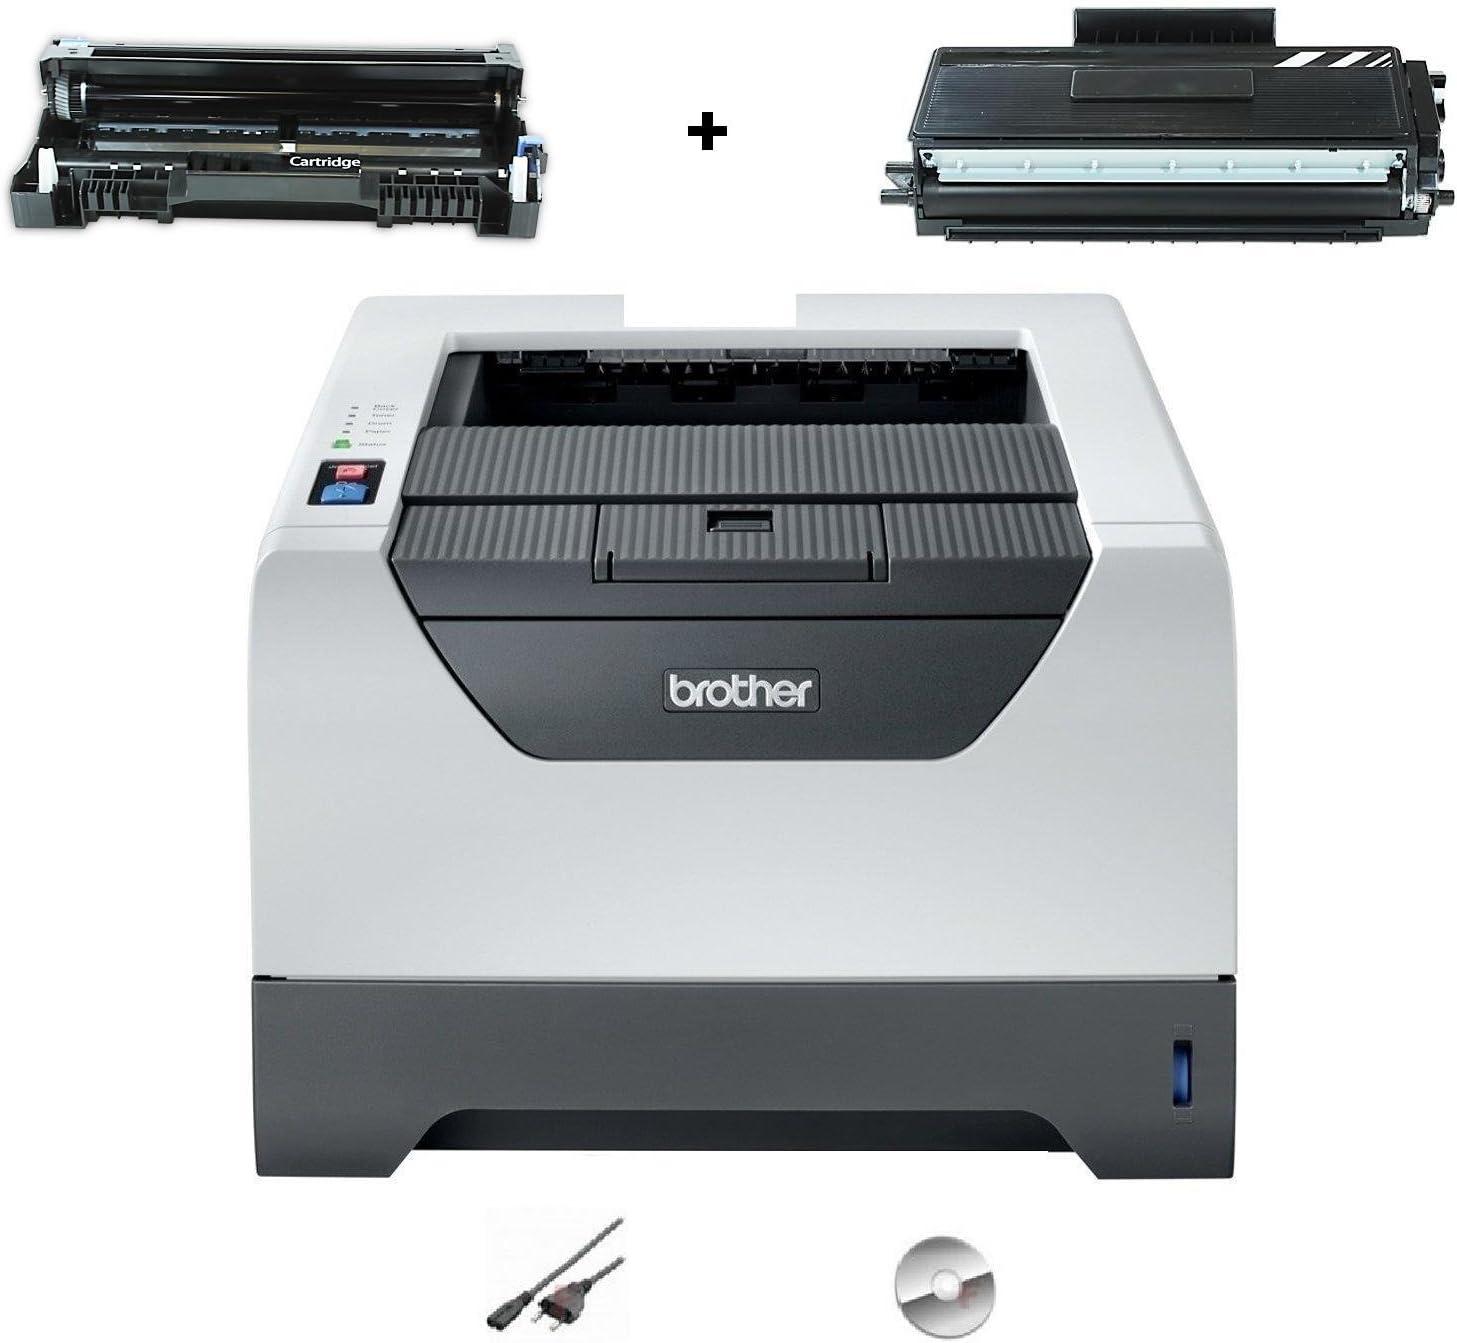 Brother HL 5340D - Impresora láser monocromo (USB, incluye tóner ...